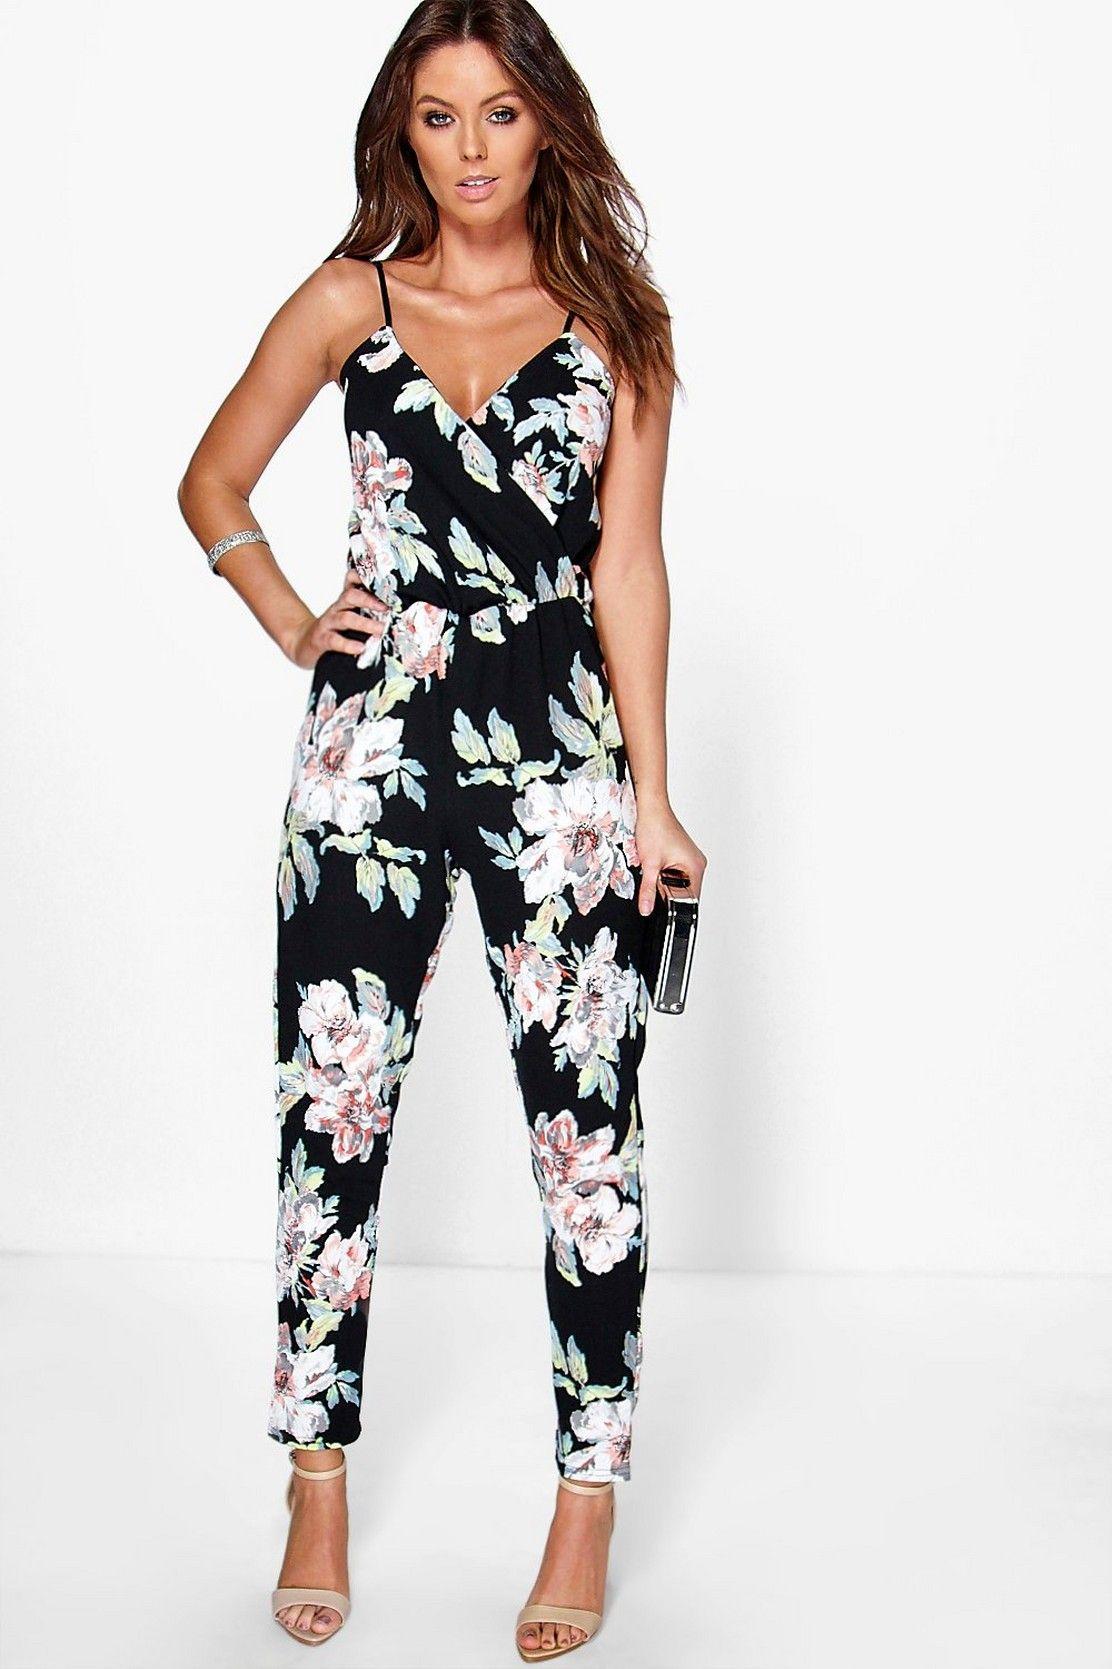 7ad87a0caa6e Floral Print Cami Wrap Strappy Jumpsuit Floral Jumpsuit